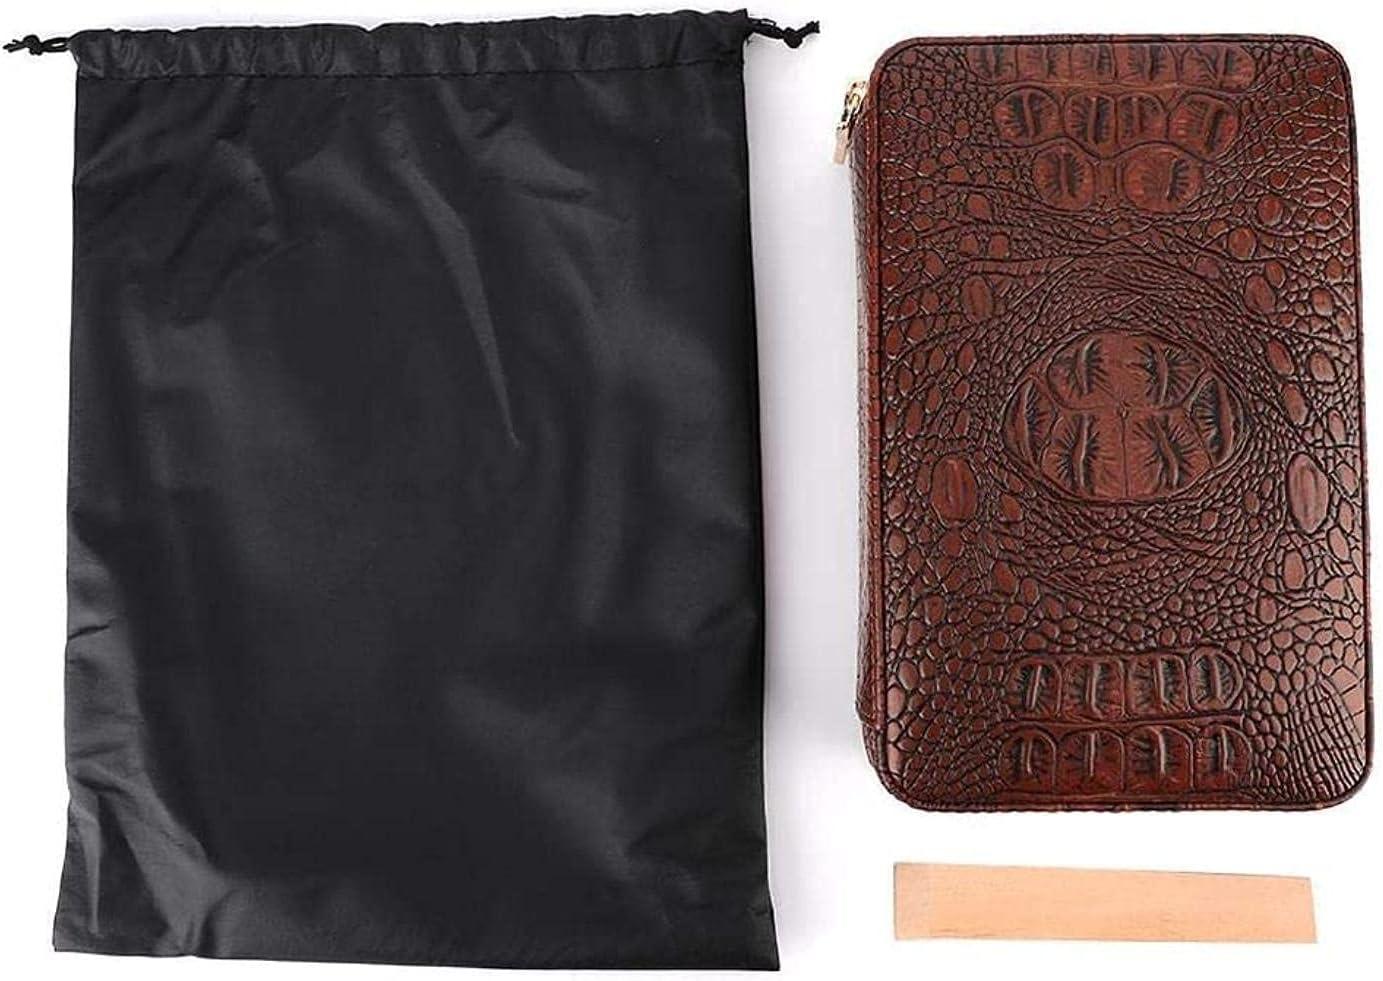 ZHJBD Max 67% OFF Smoking Set Cigar Accessories Humidor Portable Trav OFFer Wooden